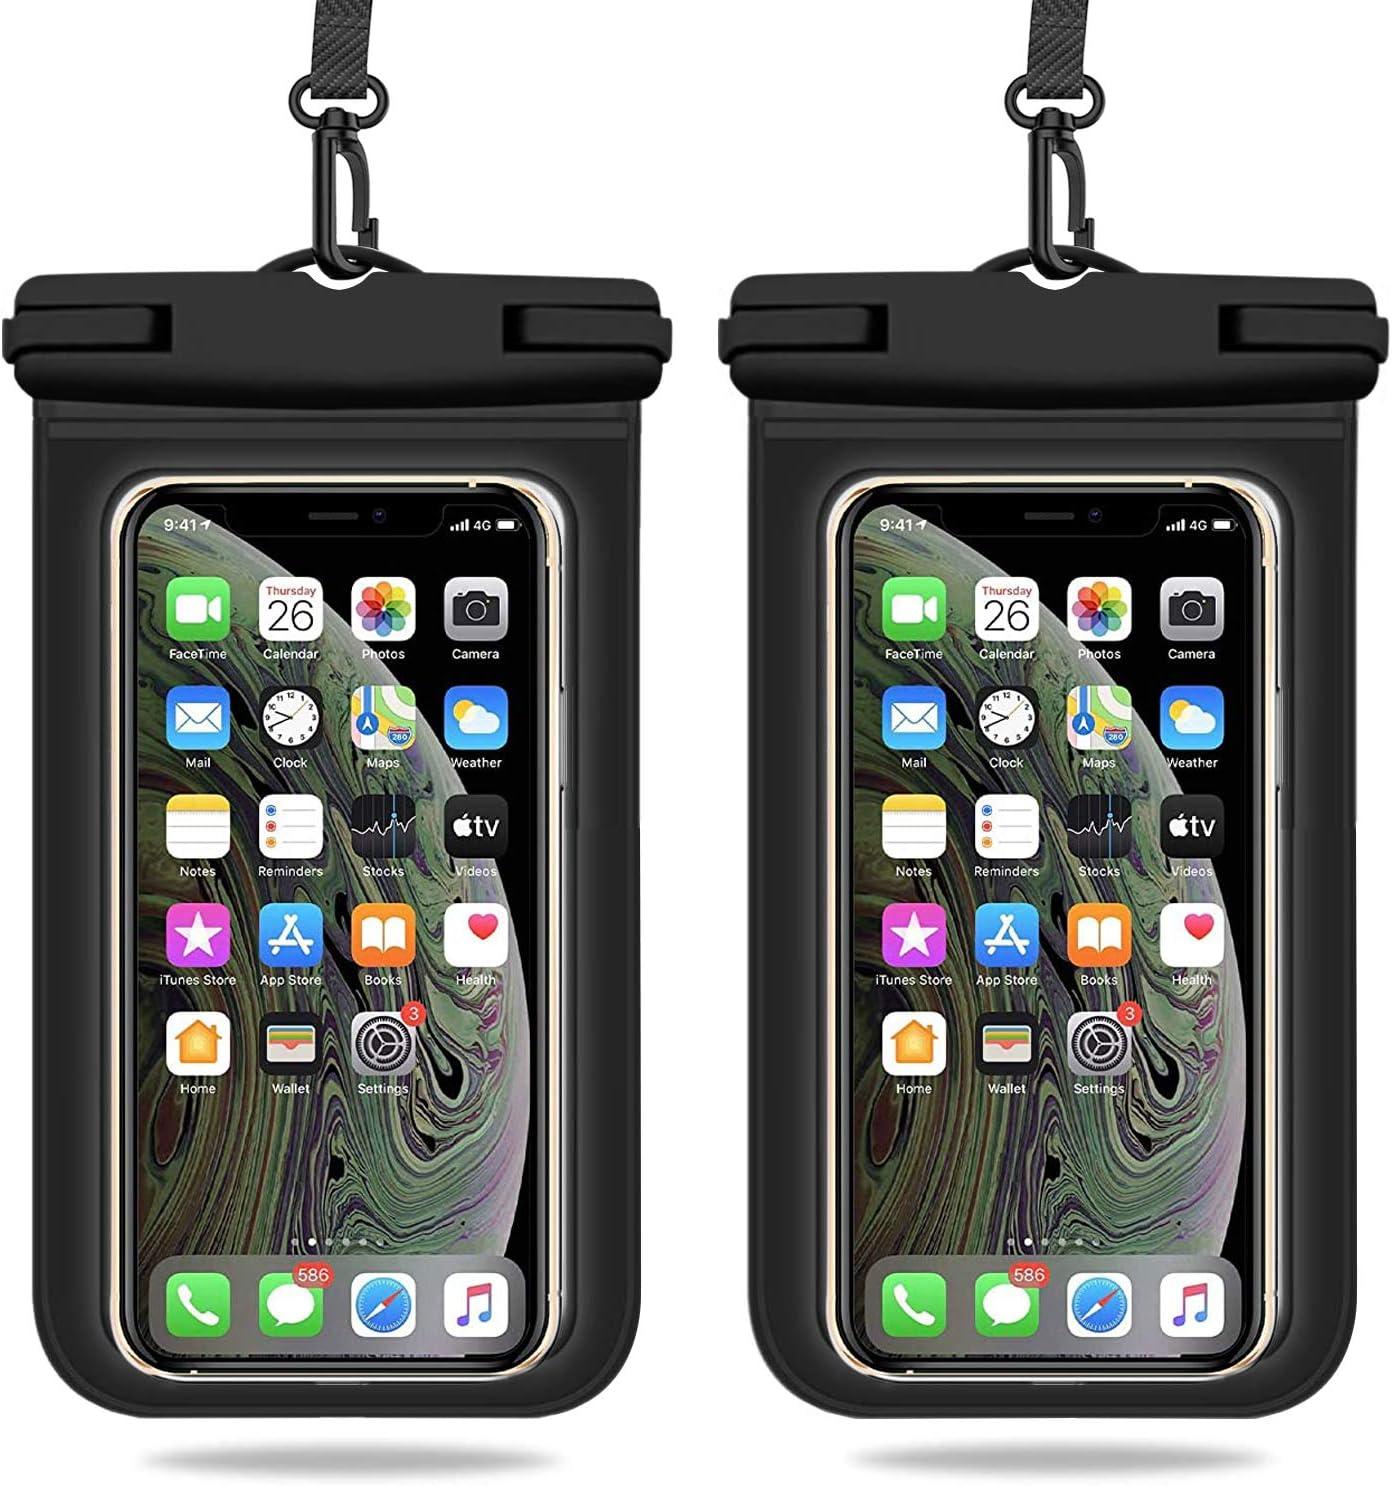 Weuiean Waterproof Phone Case, Waterproof Phone Bag with Detachable Lanyard, Phone Dry Bag for iPhone 12/11/SE/XS/XR 8/7/6Plus, Samsung S21/20/10/10+/Note up to 6.9 inch - 2Pack Black+Black